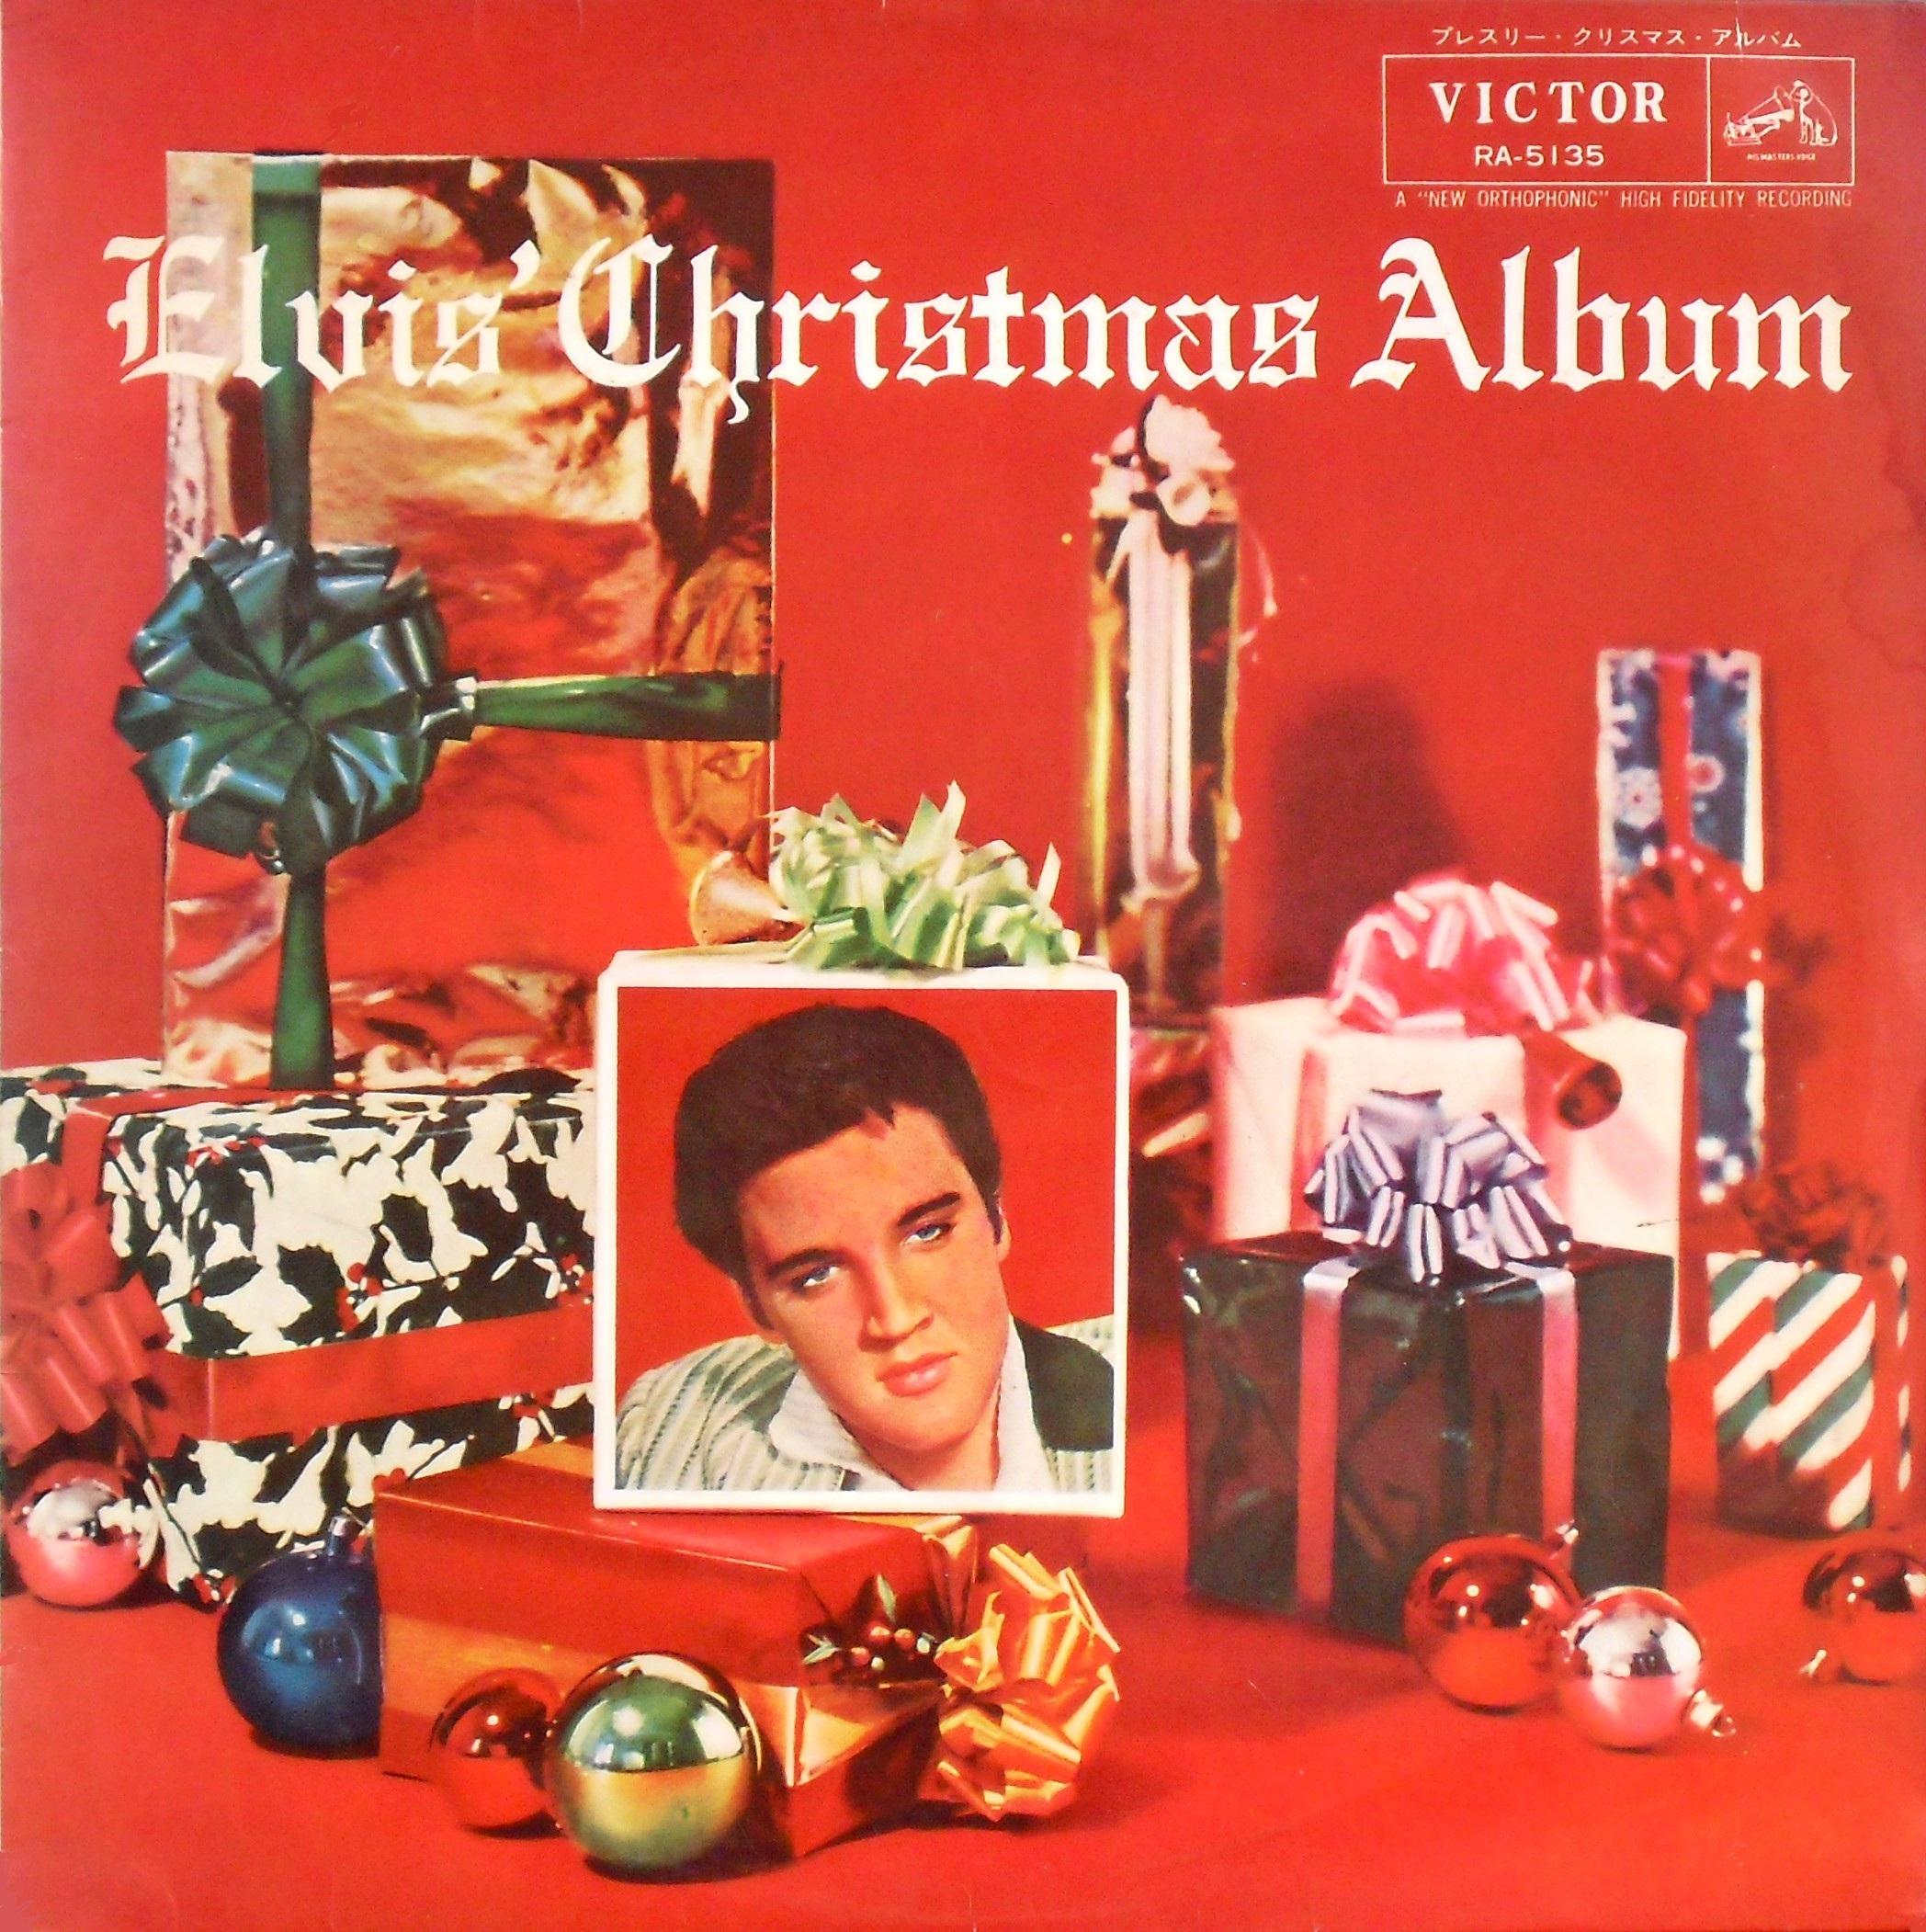 ELVIS' CHRISTMAS ALBUM 01bdj5p